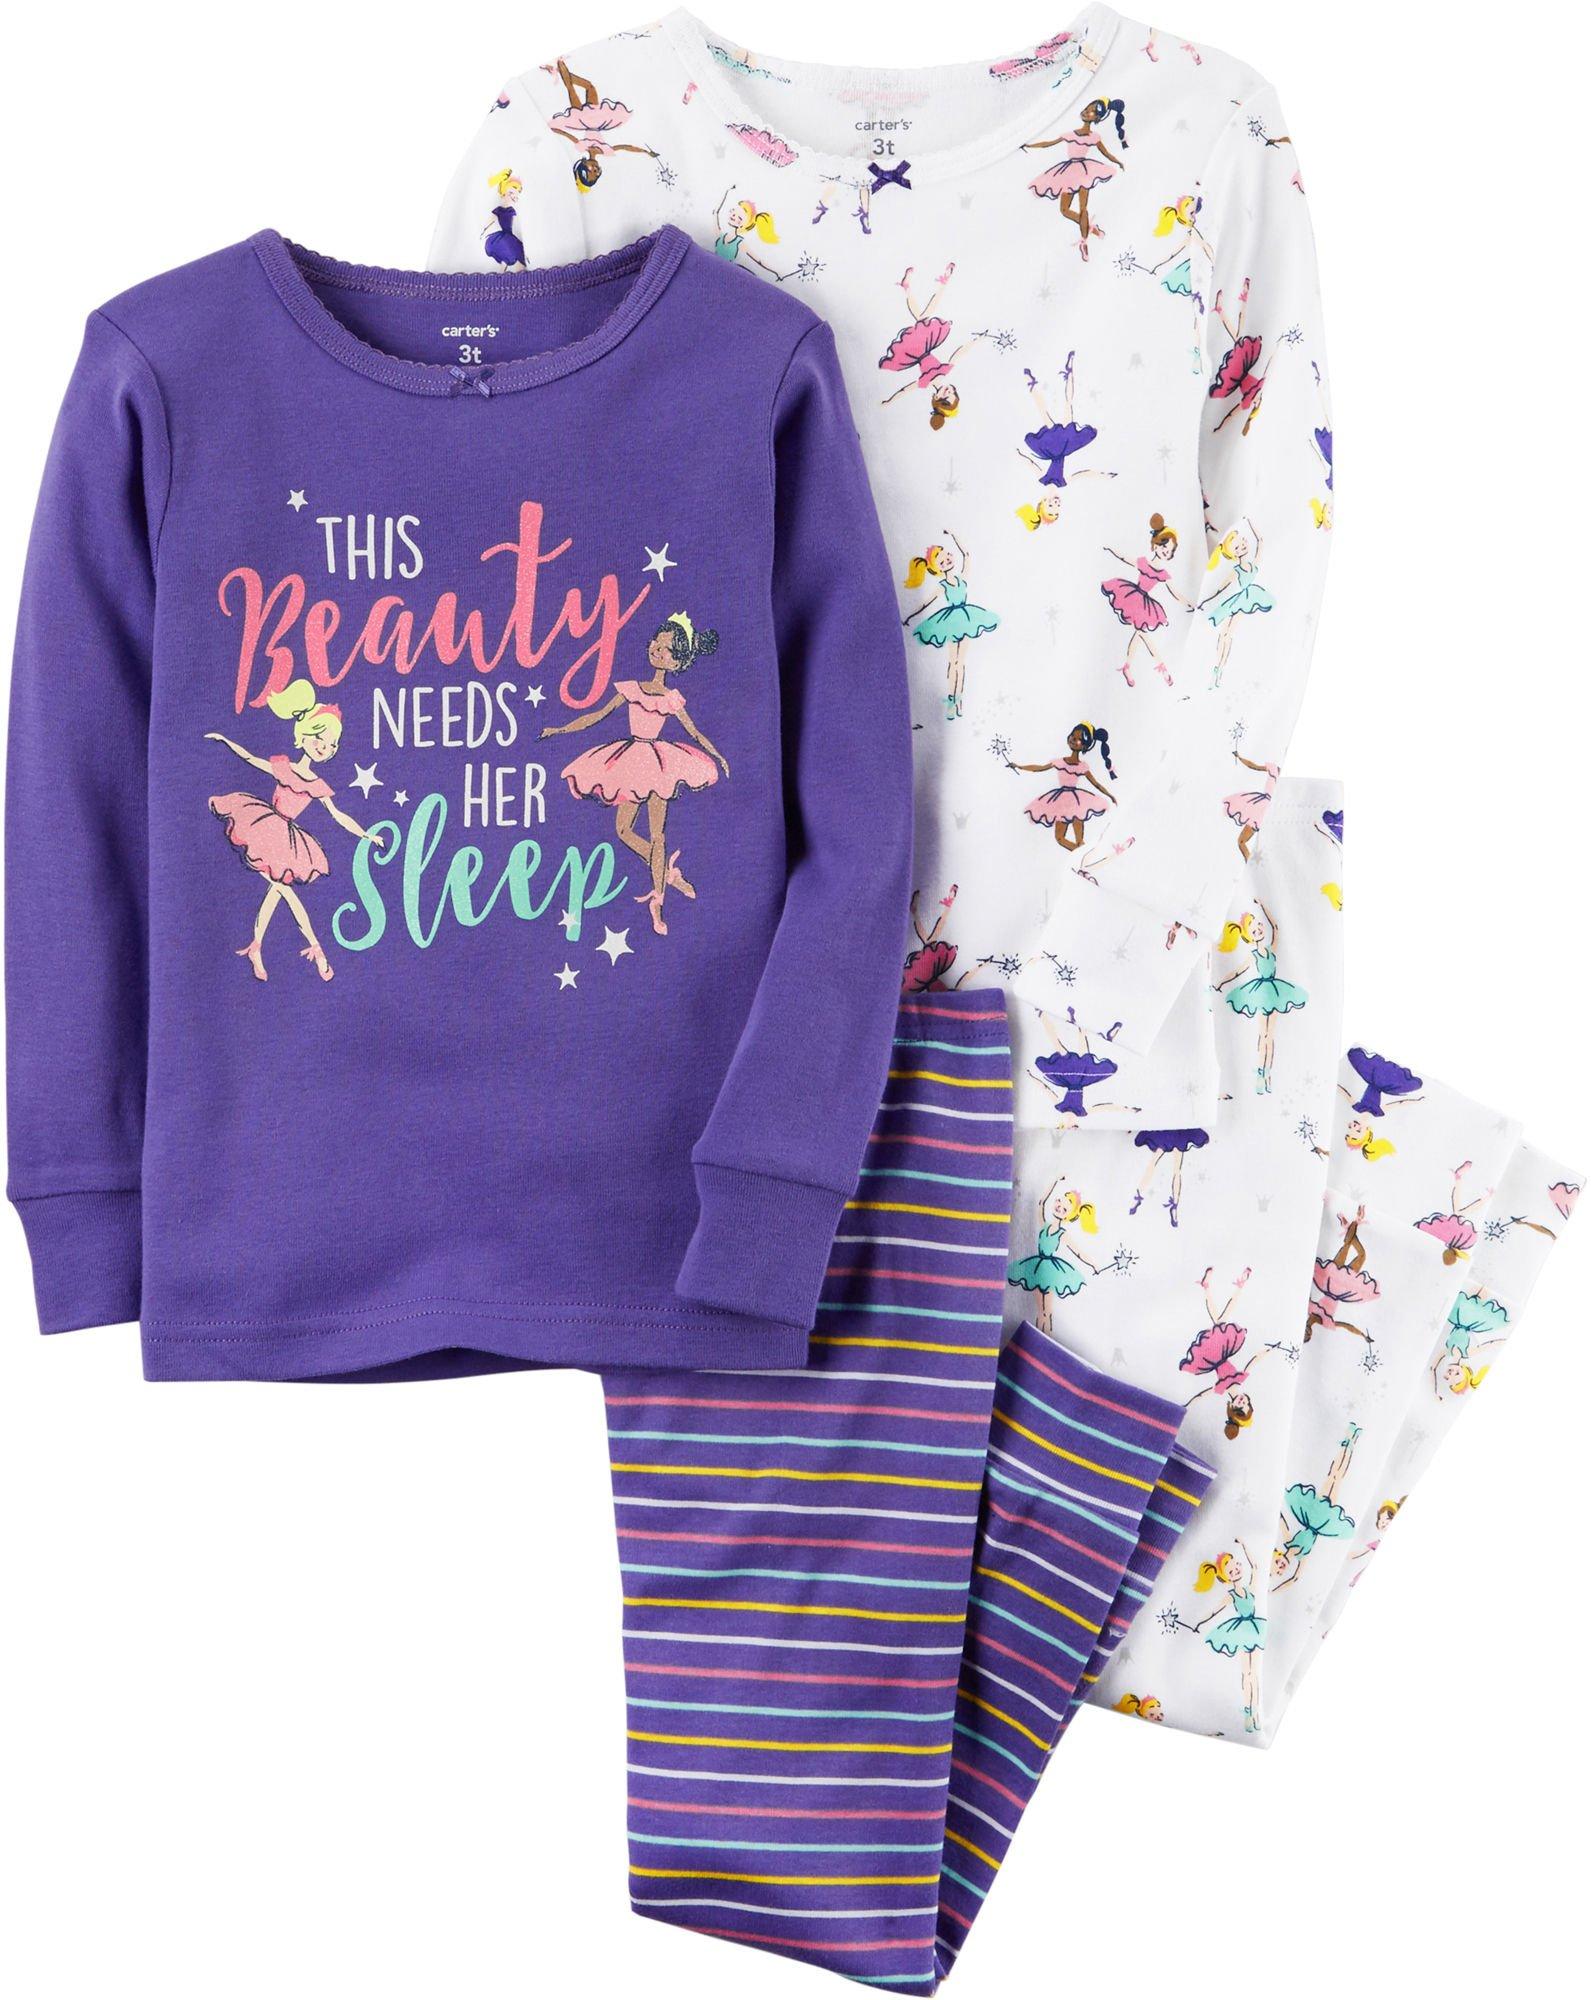 28a6c5538 Carter s Baby Girls  12M-24M 4 Piece Snug Fit Ballerina Pajamas 24 ...